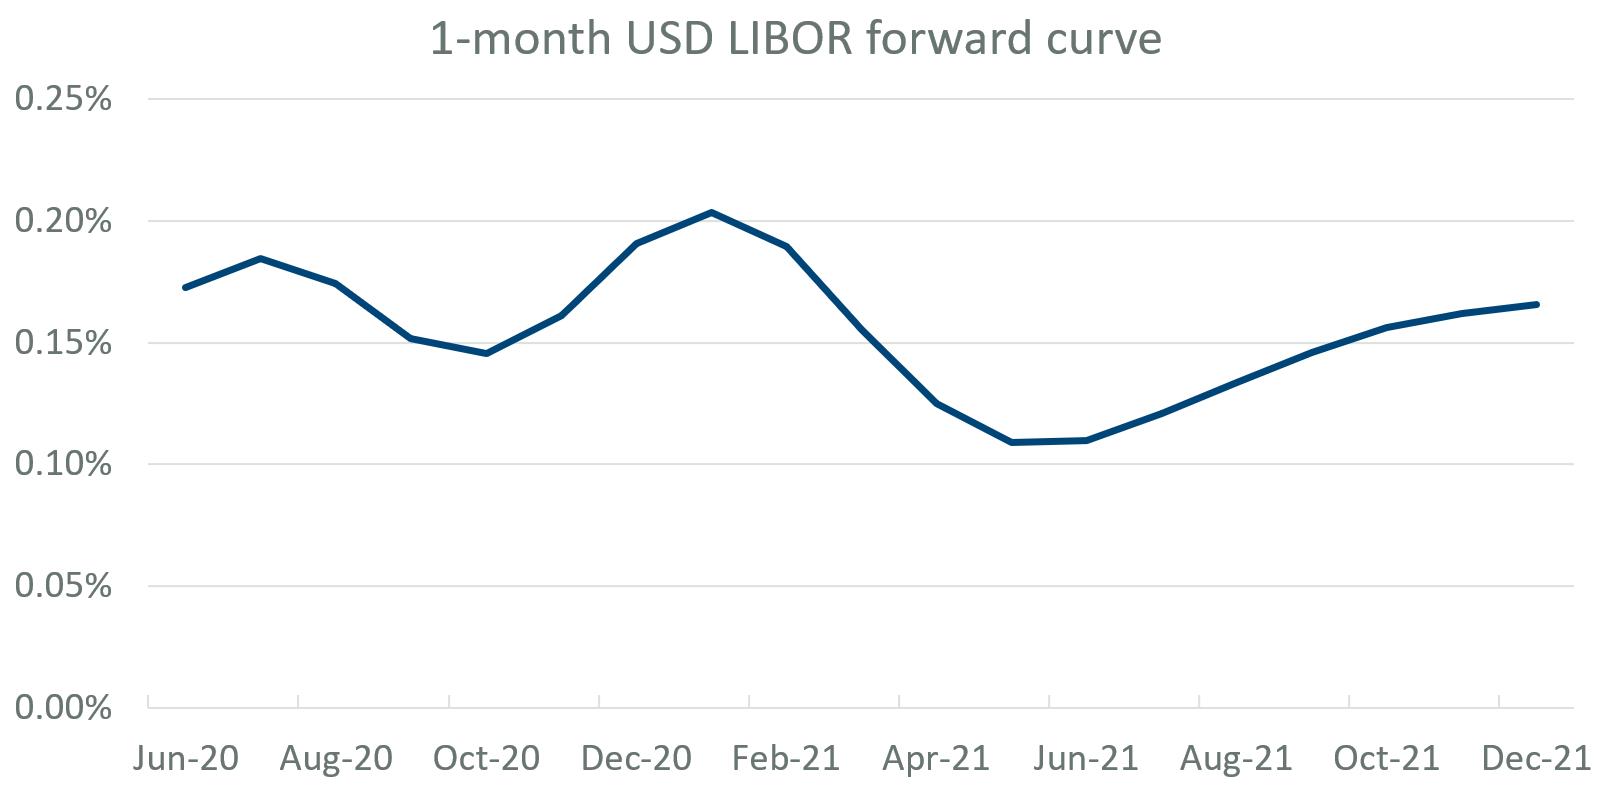 1-month USD LIBOR forward curve